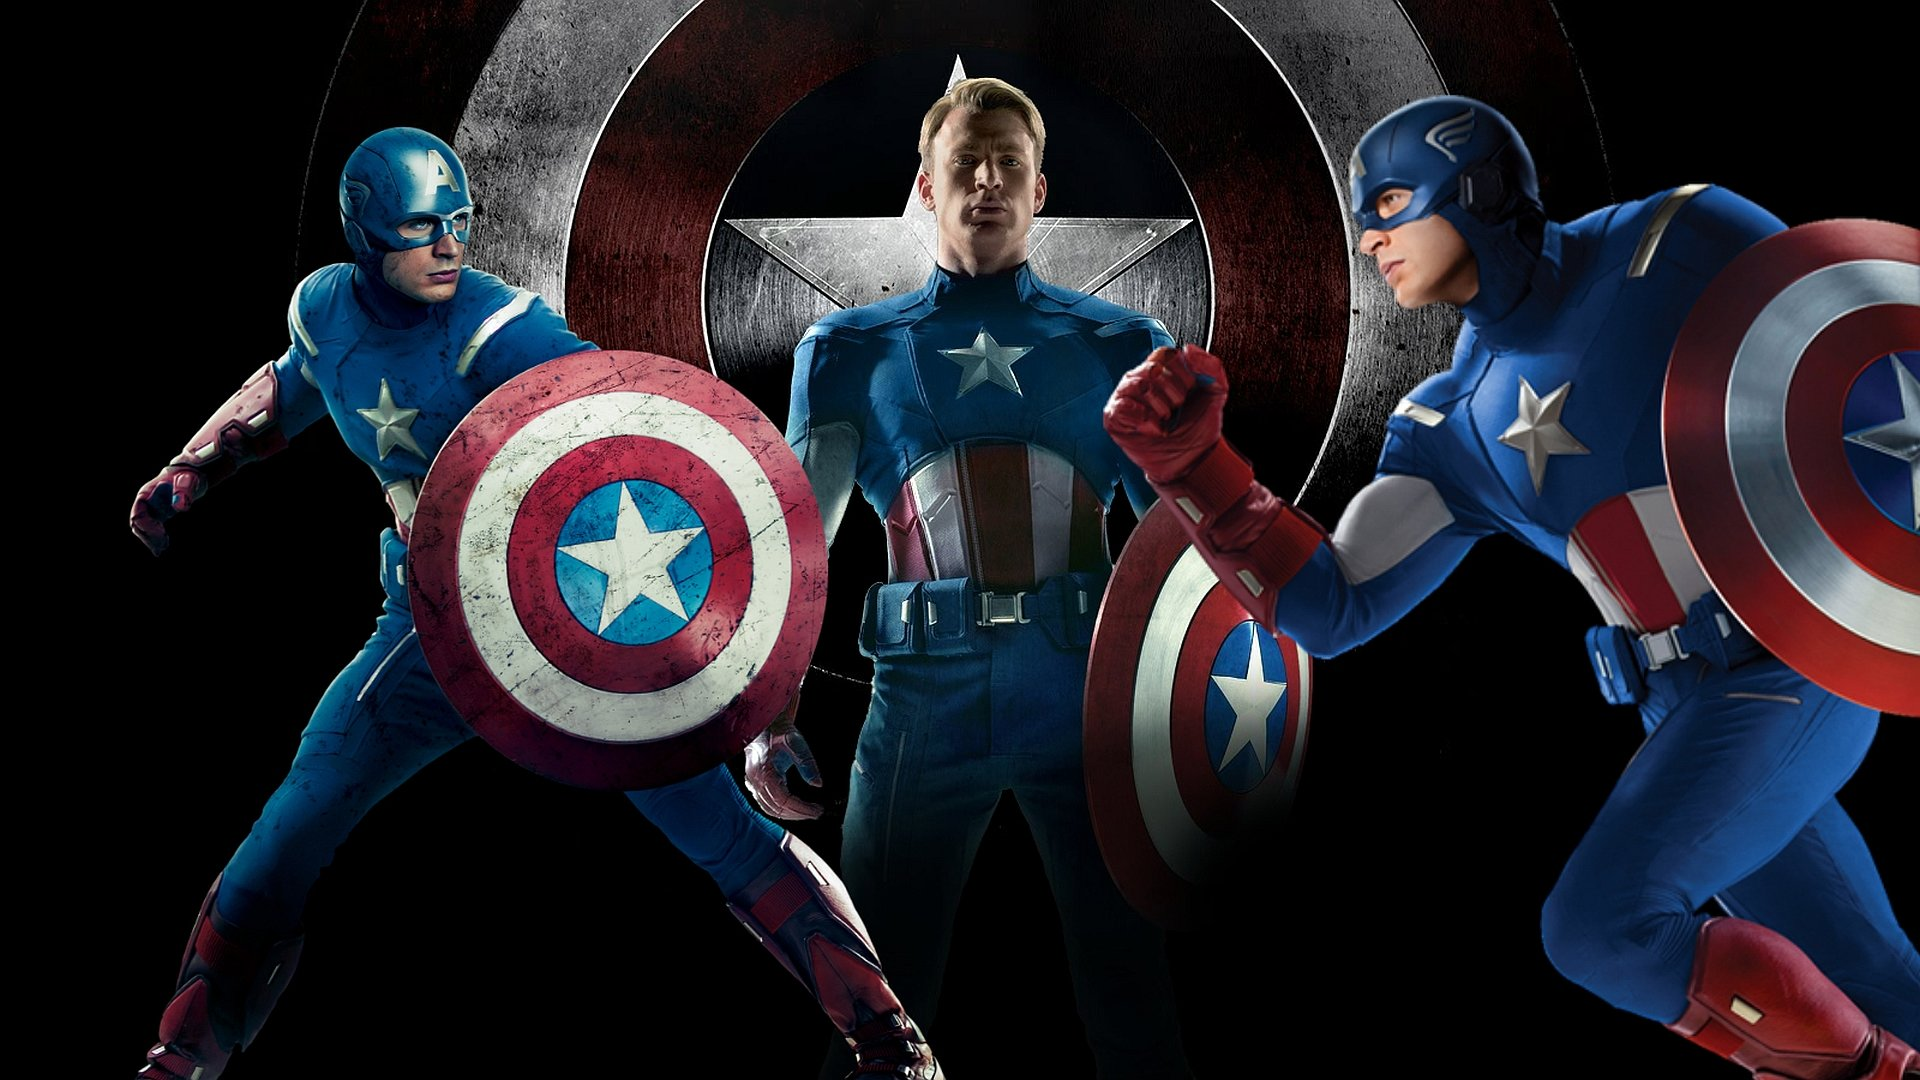 Best Captain America The First Avenger Wallpaper Id 497146 For High